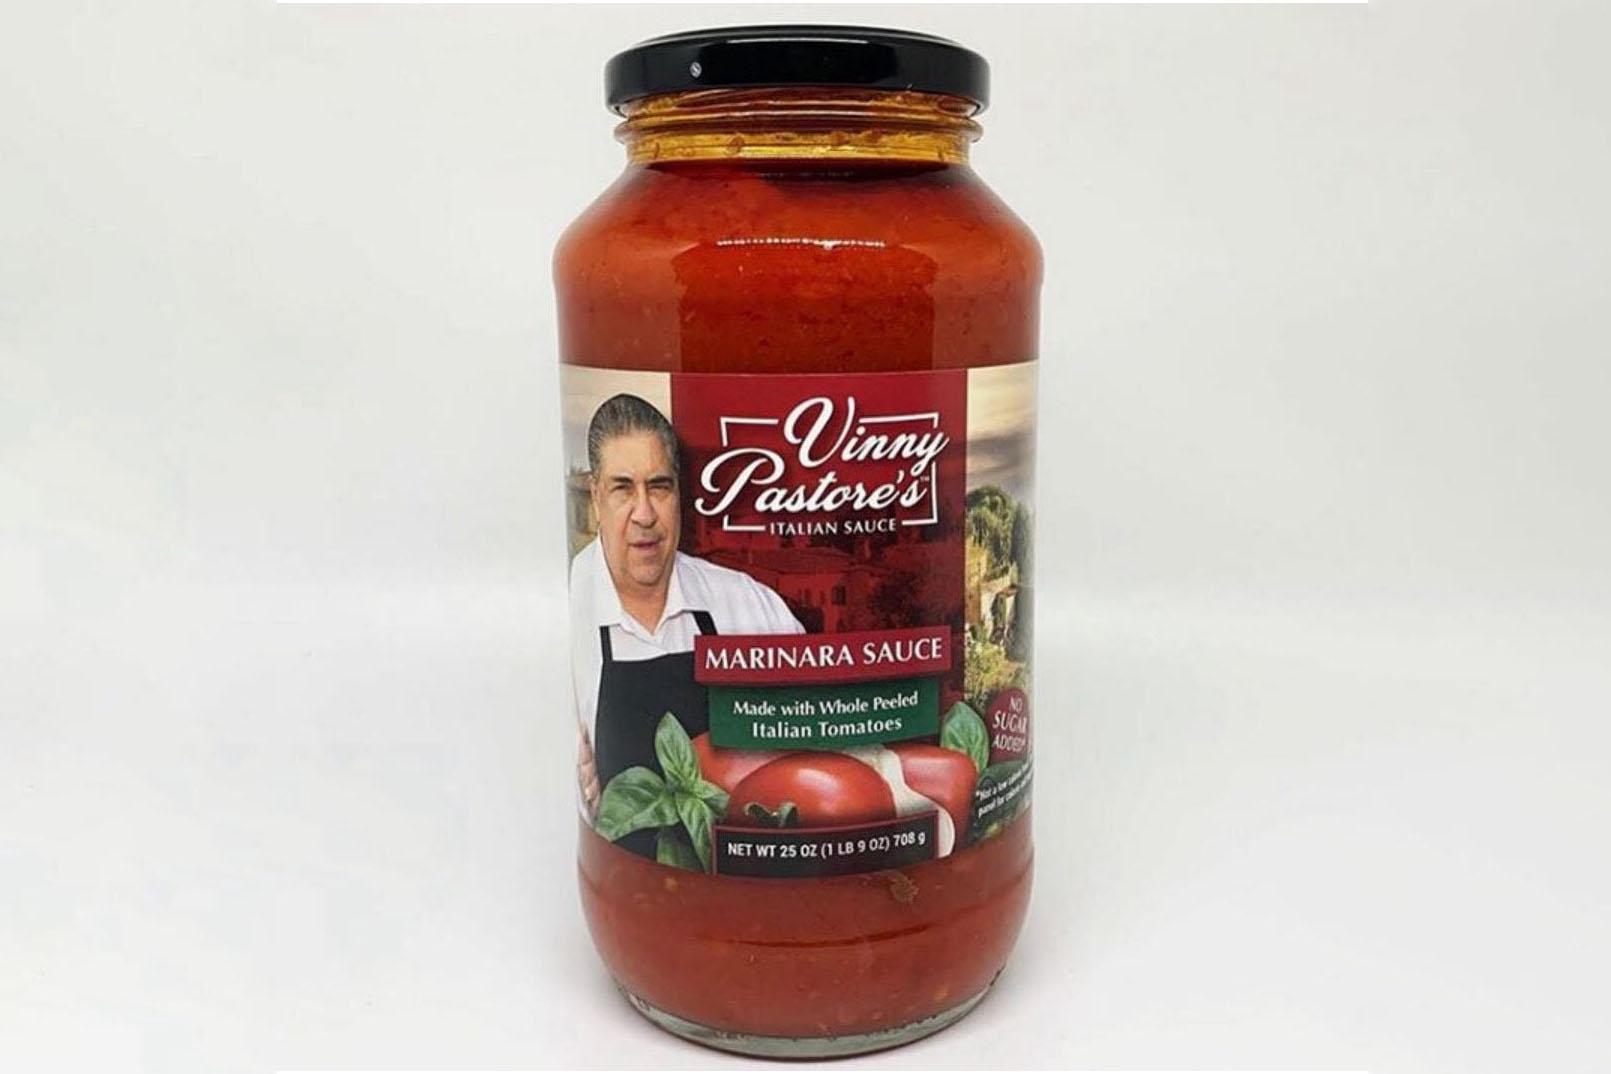 jar of vinny pastore marinara sauce